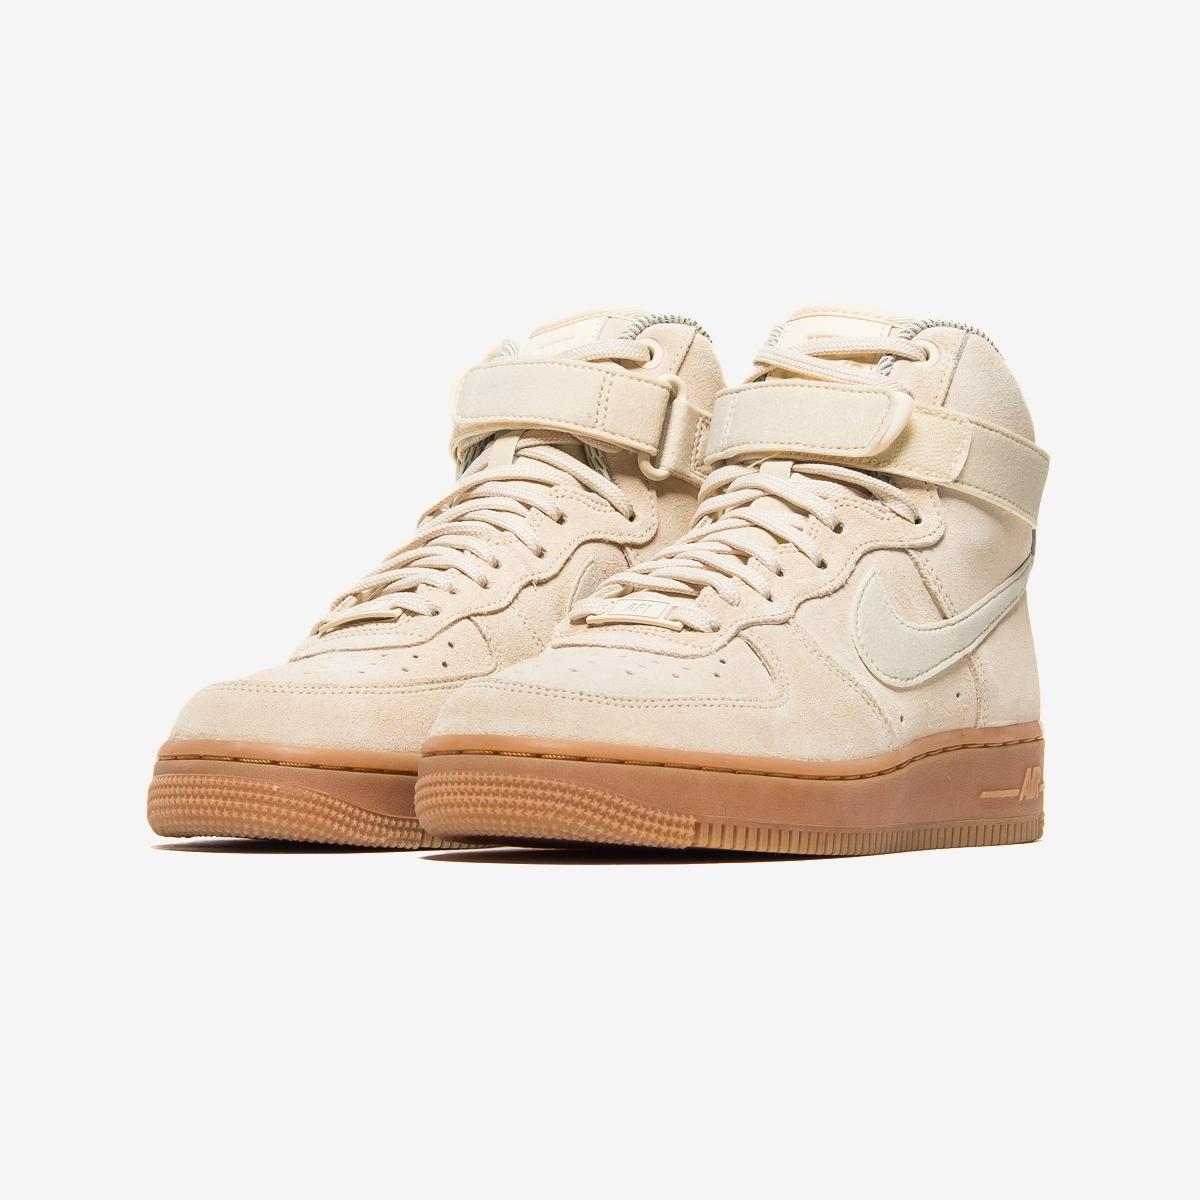 Nike Dames Air Force 1 High Suede Zwart Gum 860544 004